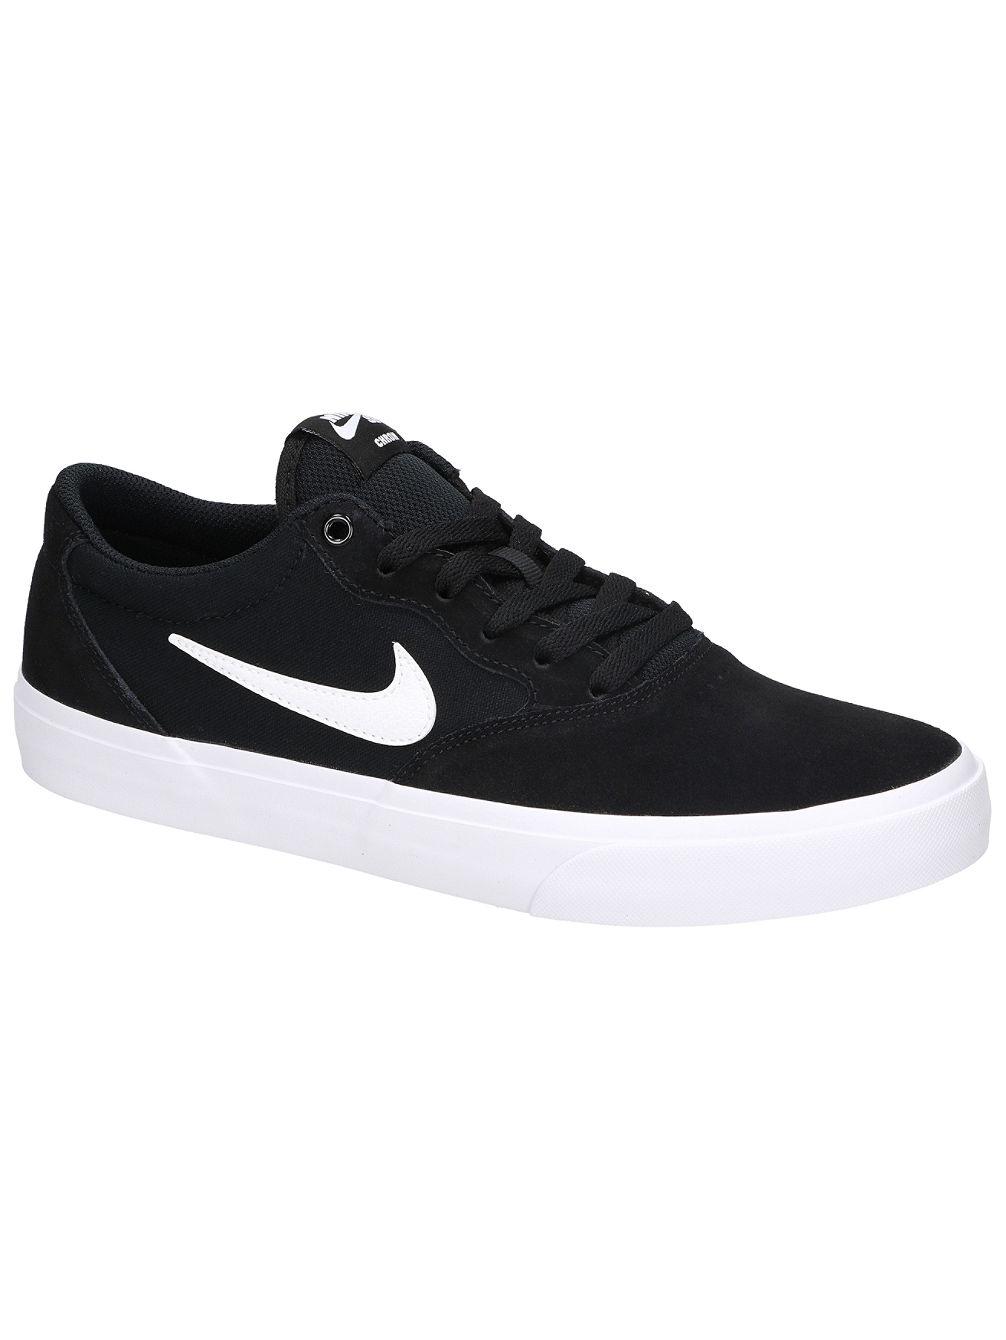 d528e68bbfd6 Køb Nike SB Chron SLR Skate Shoes online hos Blue Tomato